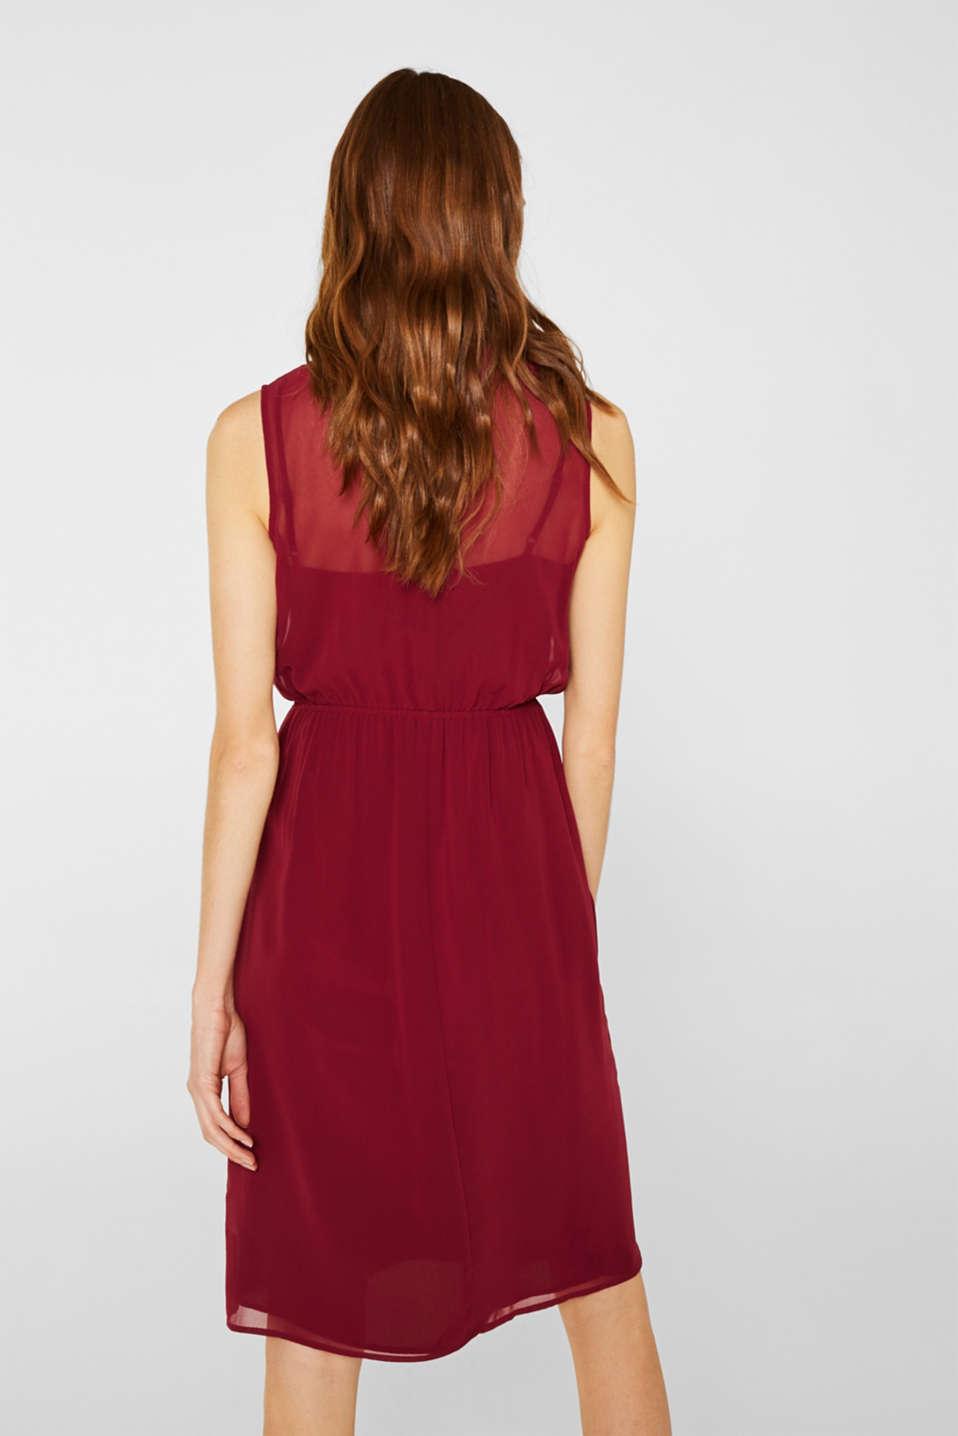 Chiffon dress with slip, GARNET RED, detail image number 2